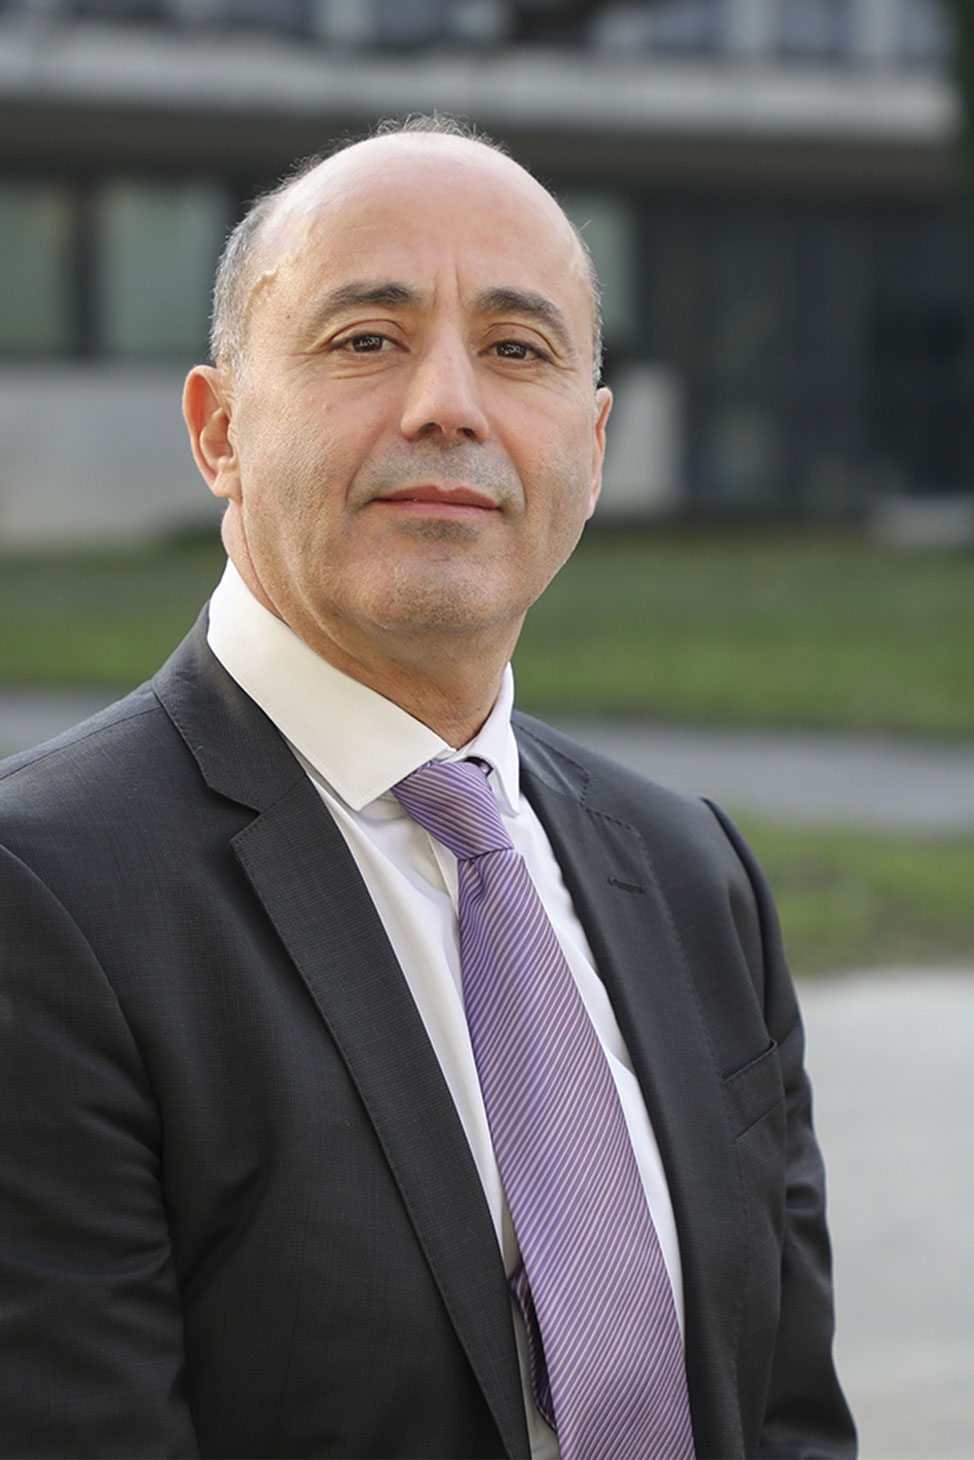 Yassine Lakhnech